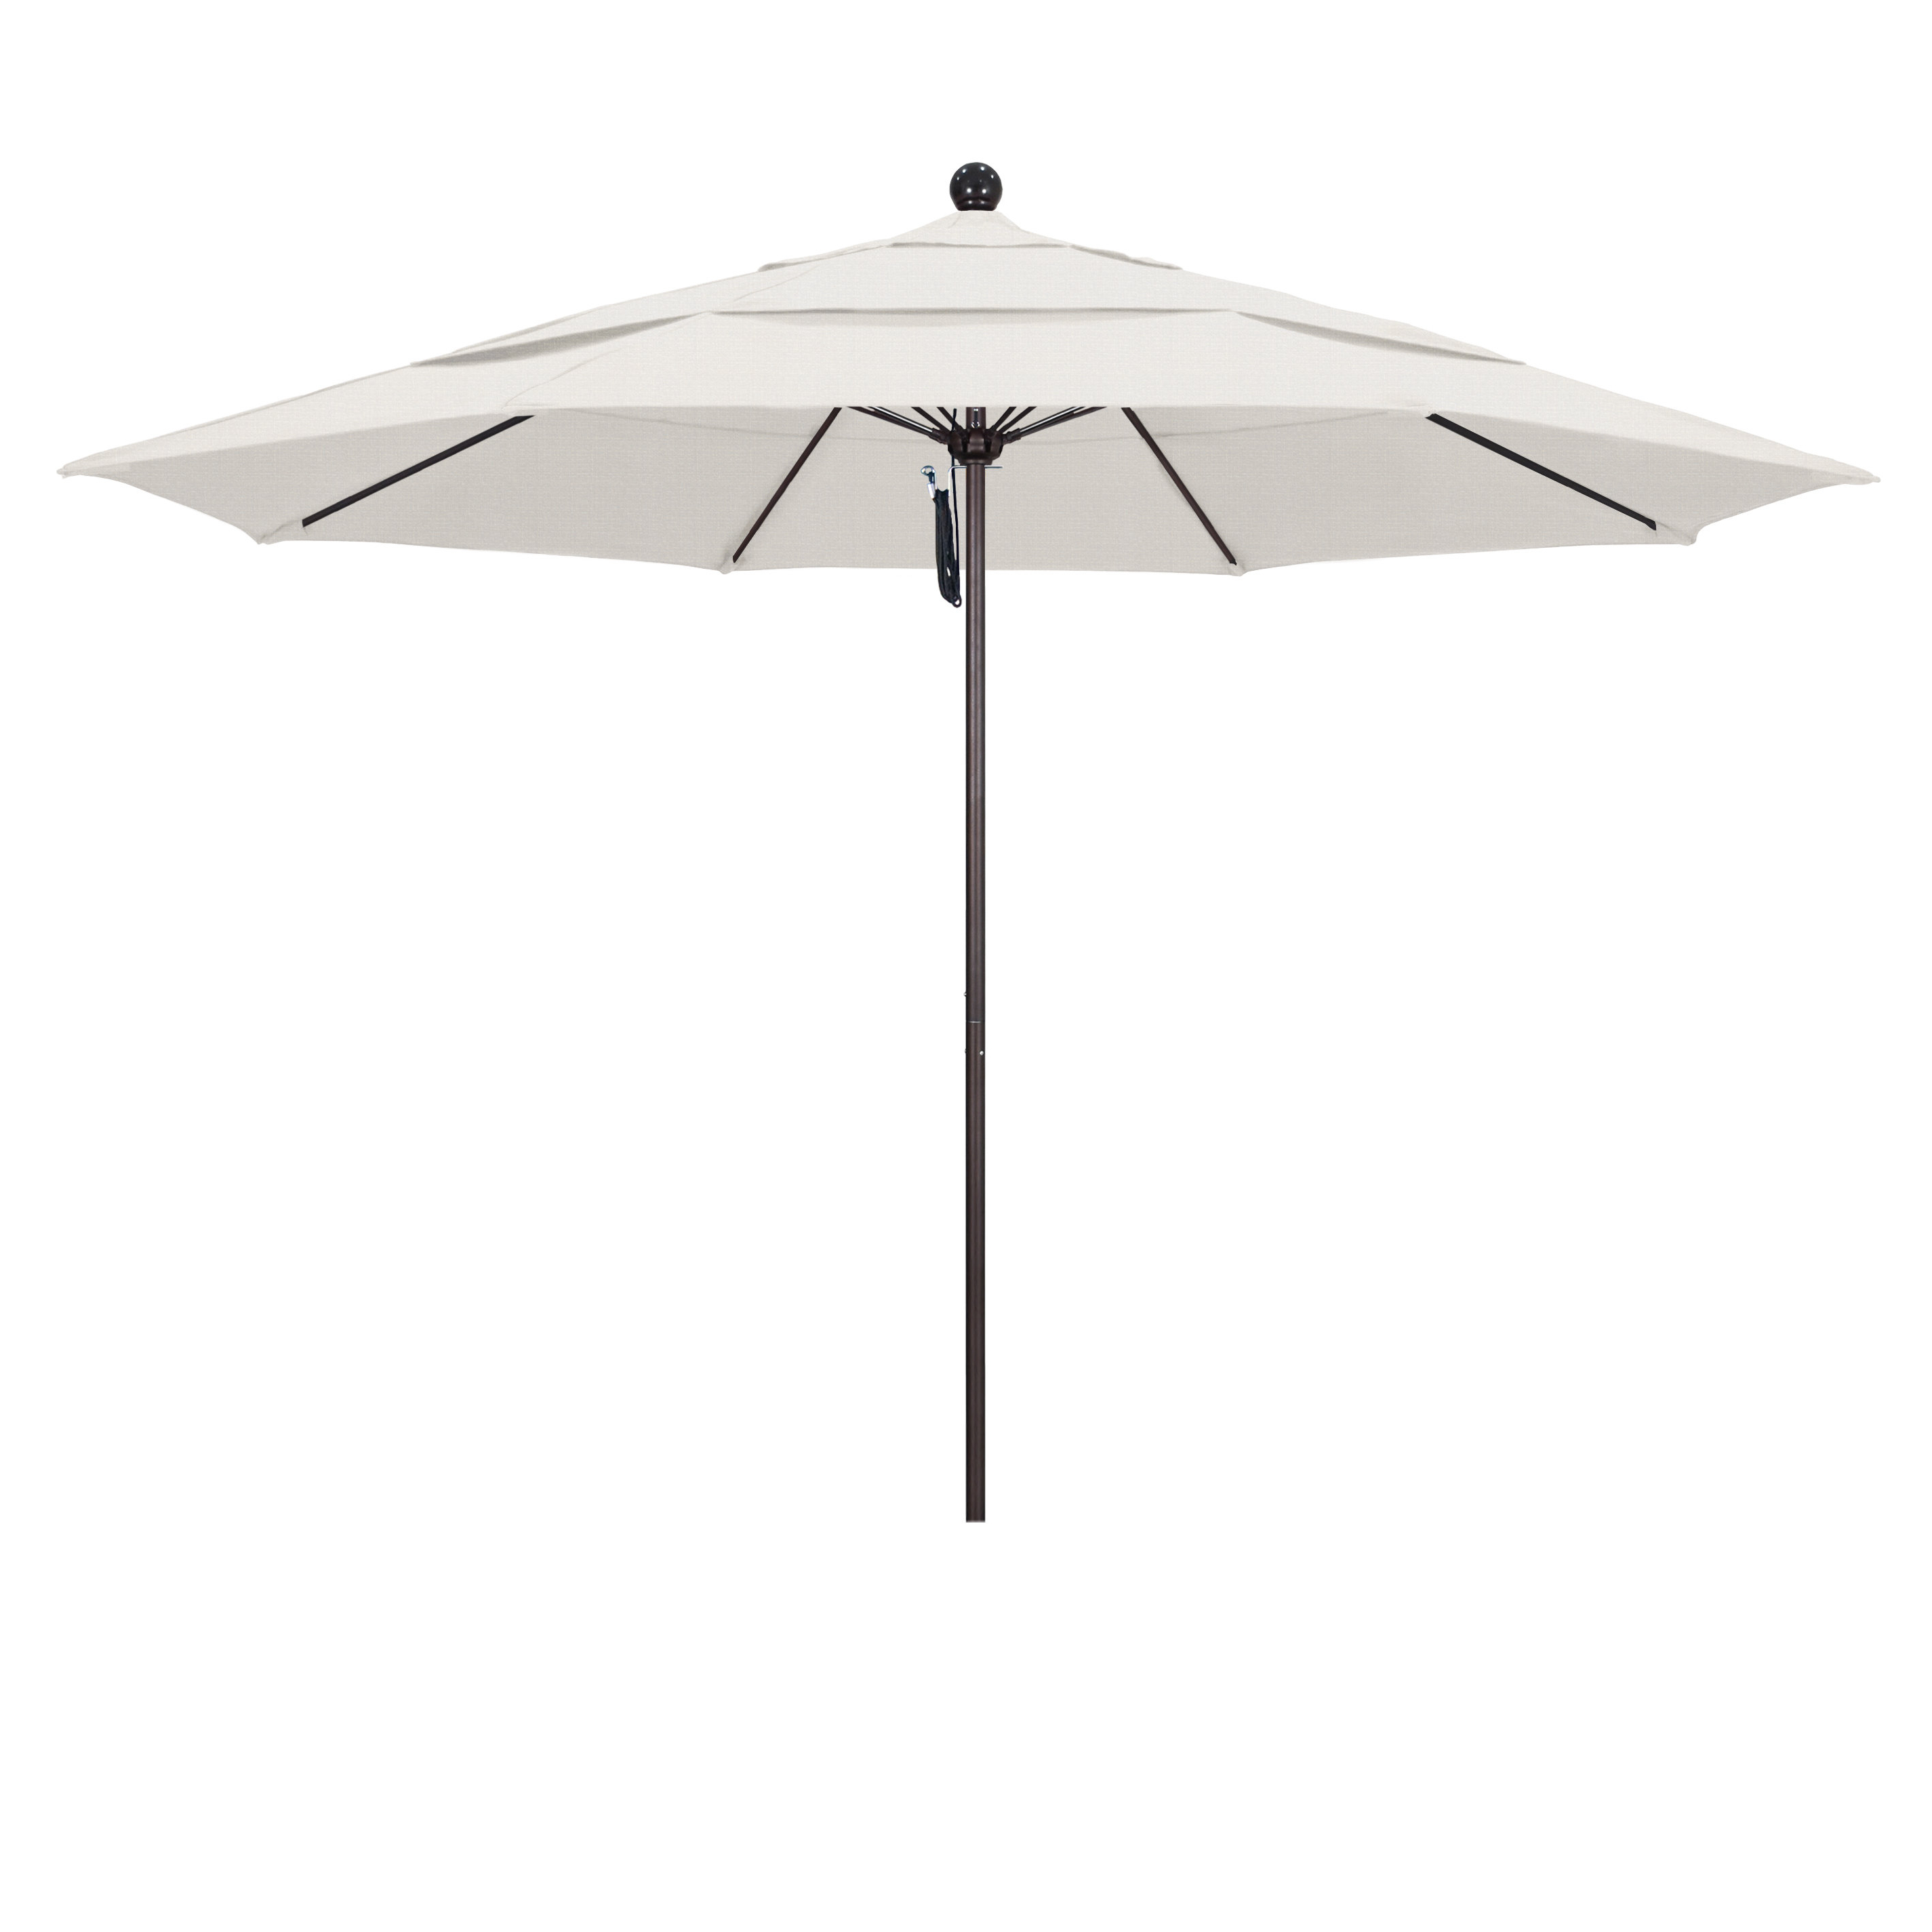 Launceston Market Umbrellas In Most Up To Date Davenport 11' Market Umbrella (Gallery 8 of 20)